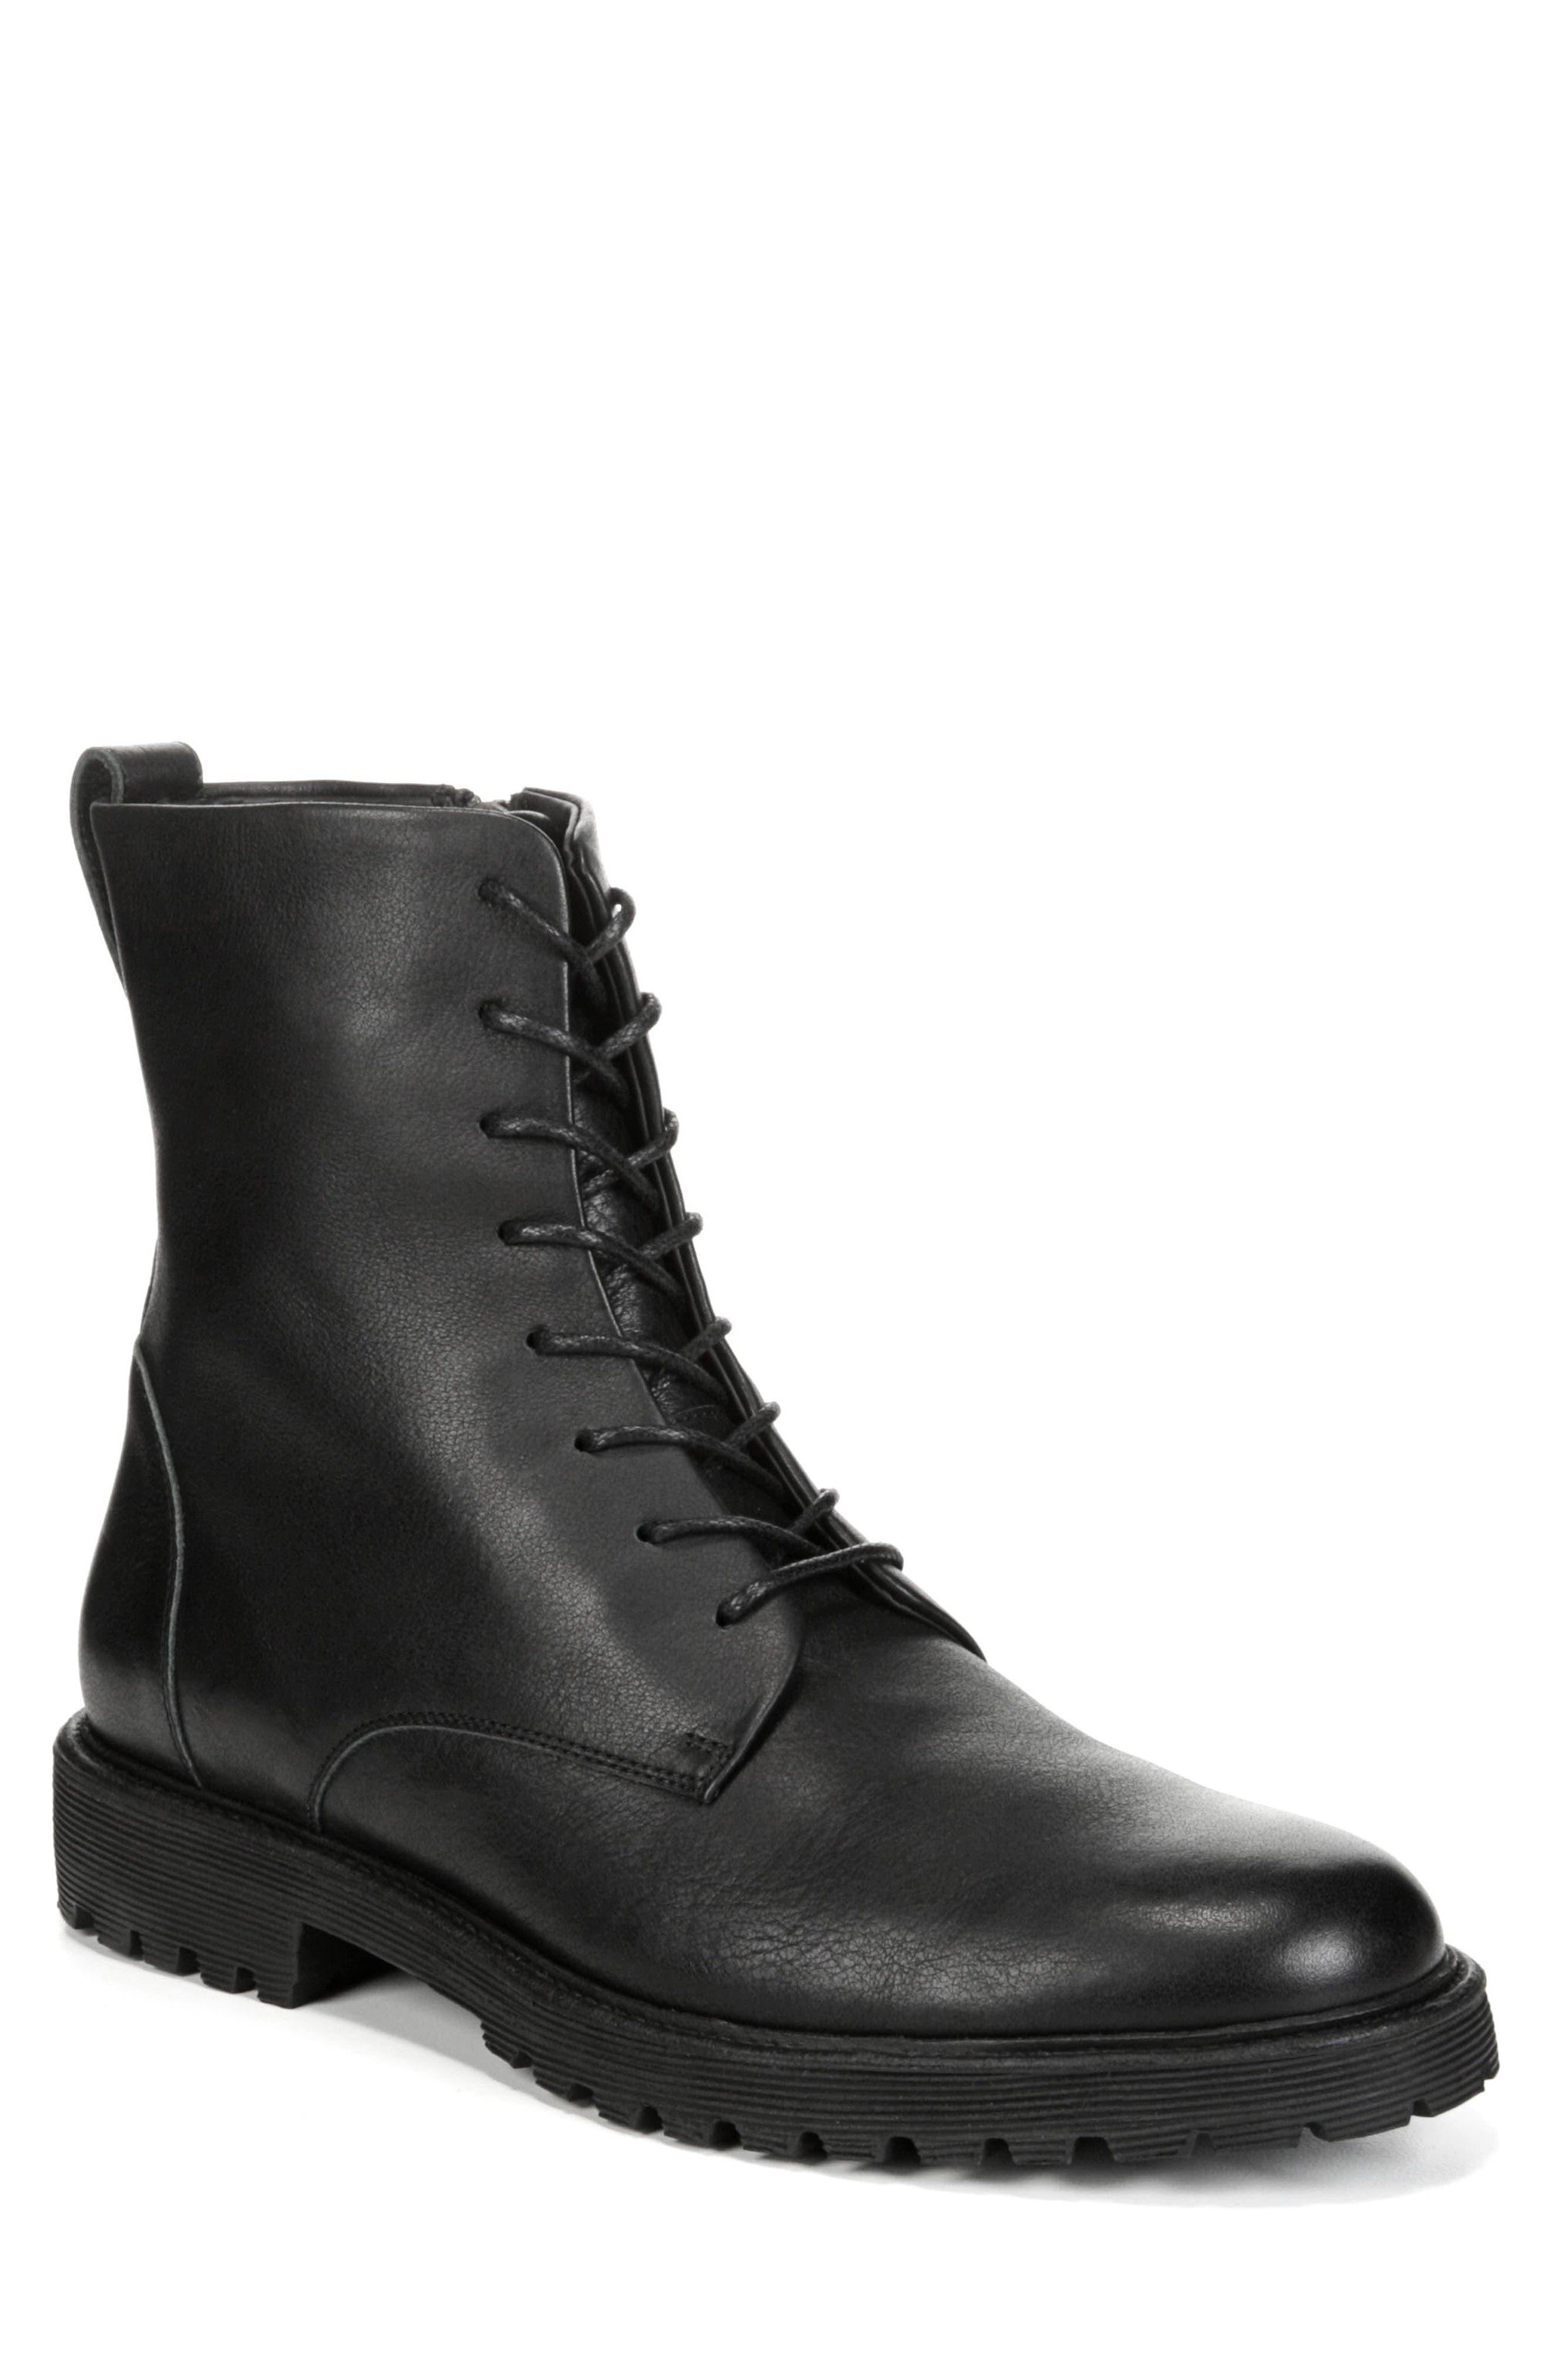 Brigade Plain Toe Boot,                             Main thumbnail 1, color,                             001